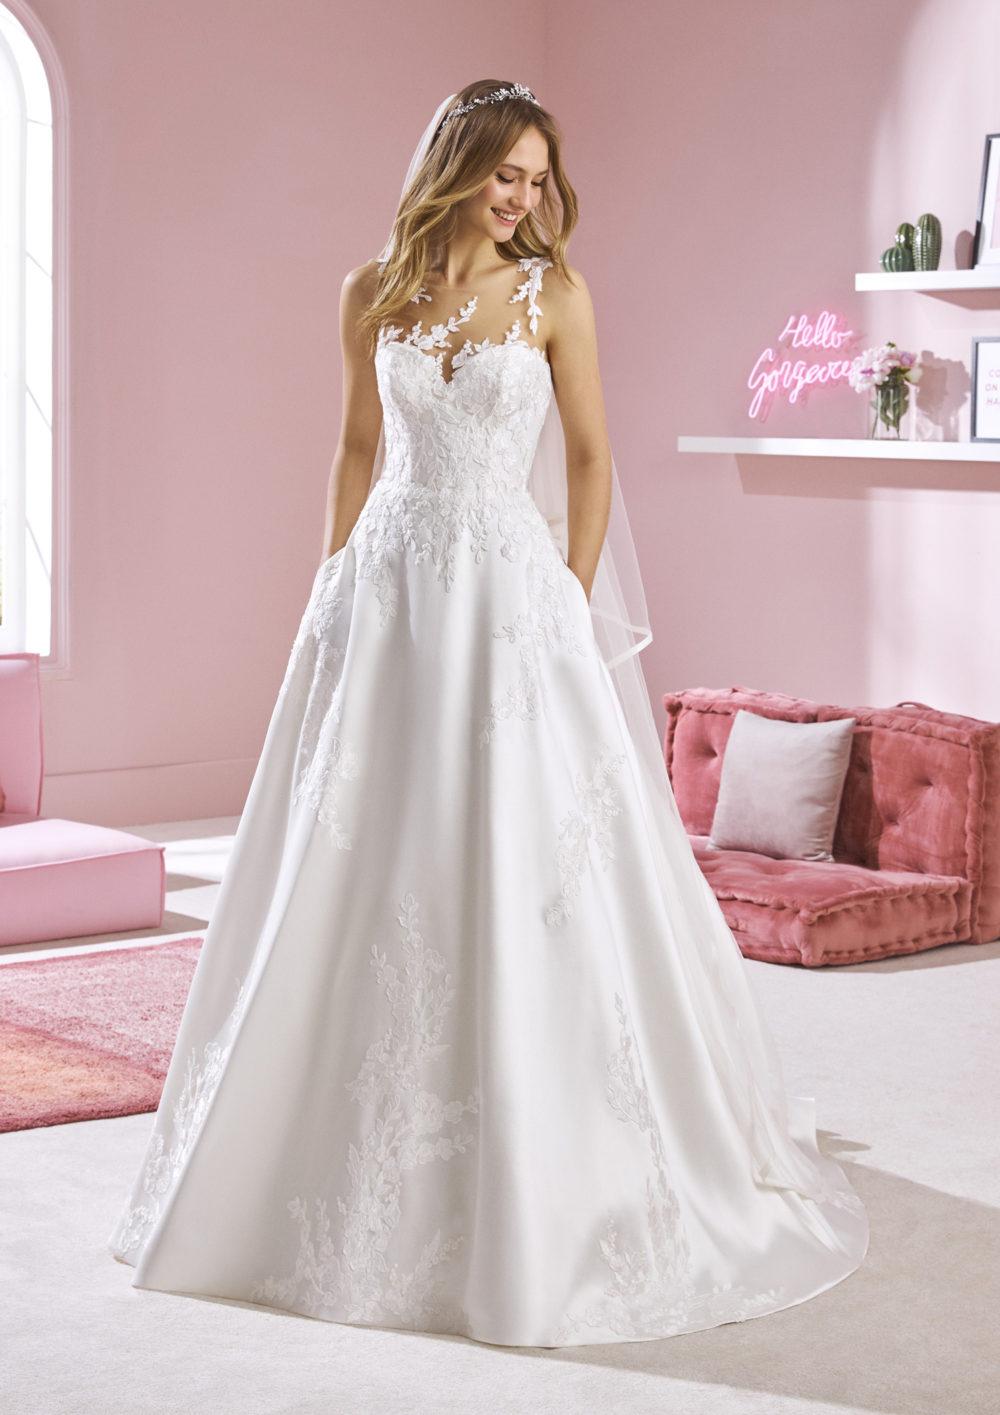 Mariages: abito da sposa Poème 2020 a Vicenza, Verona, Padova, Veneto ZUZU